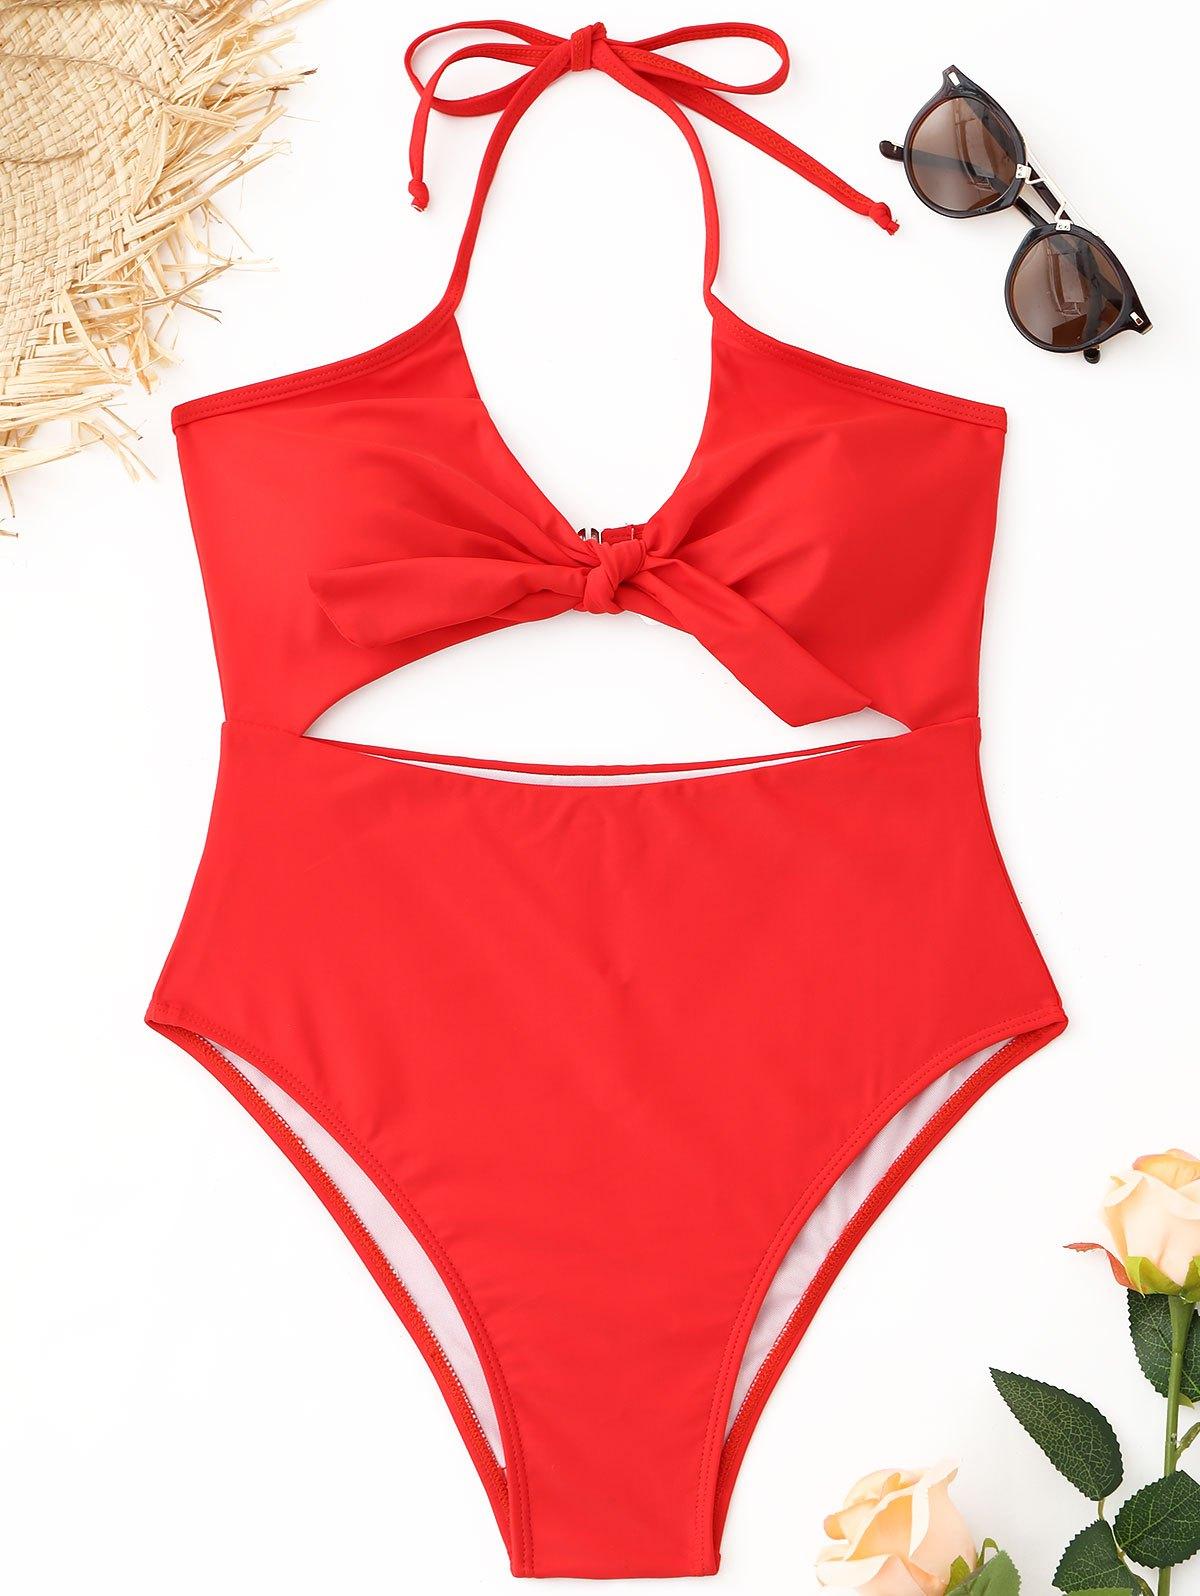 Halter Cutout High Cut Swimsuit